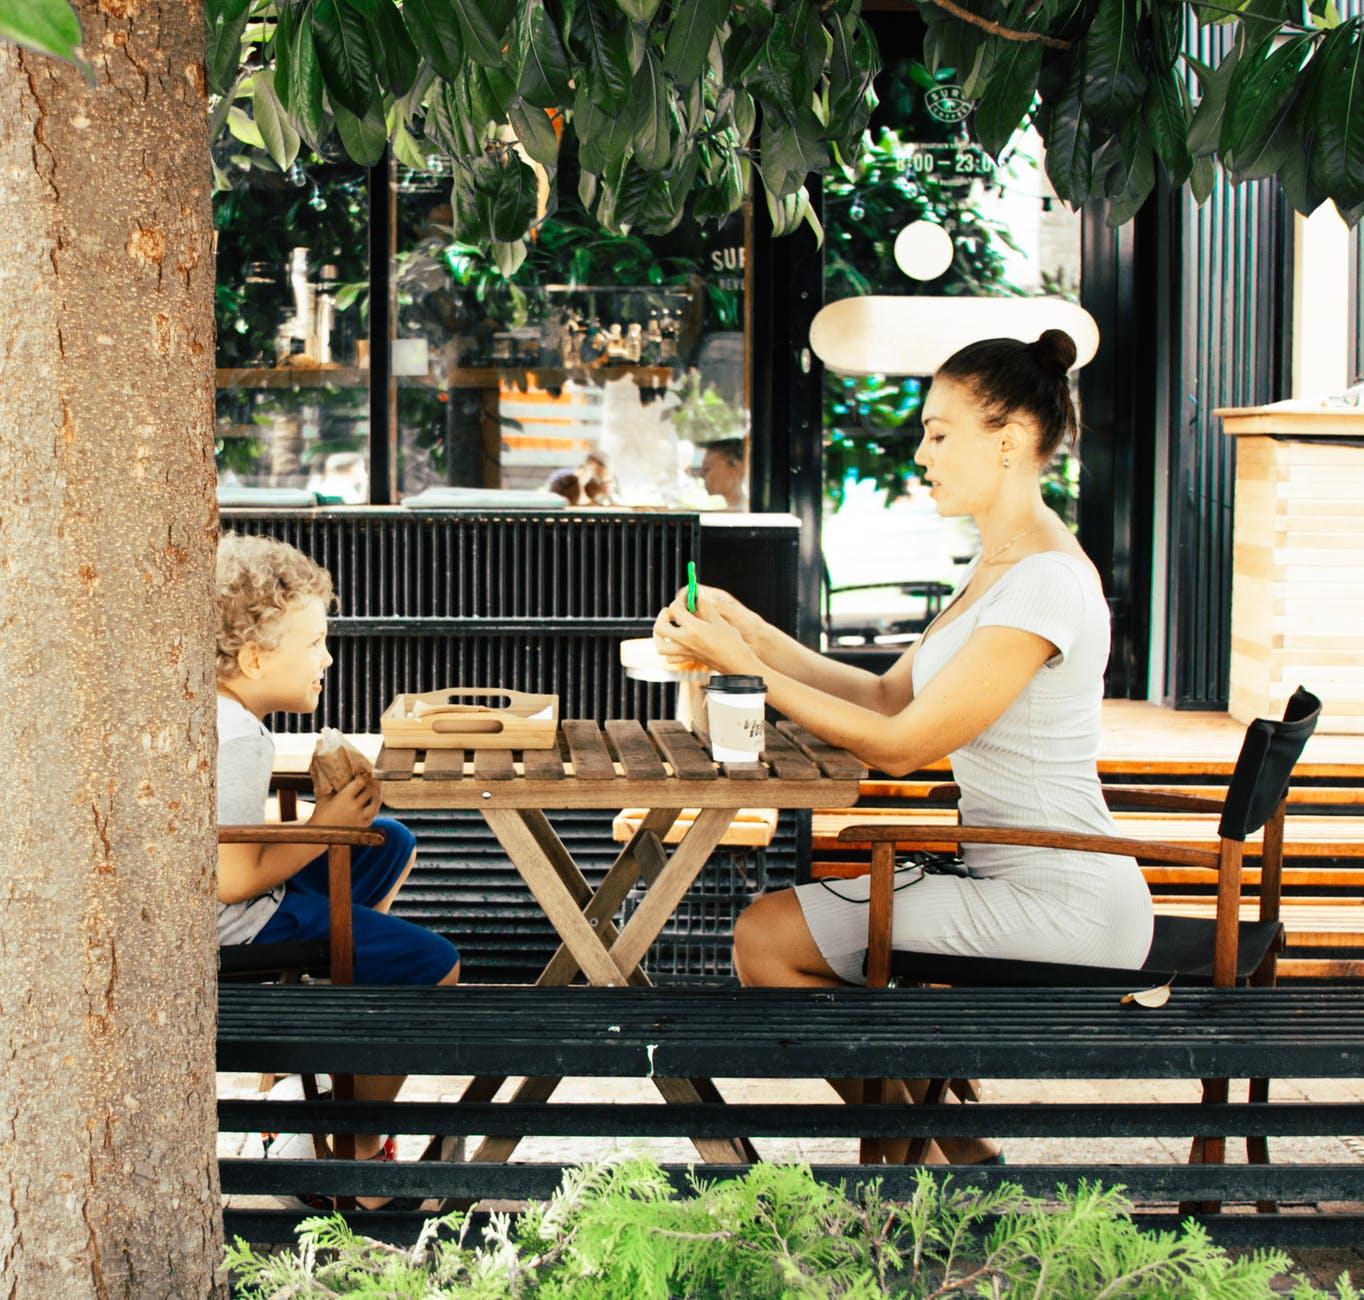 Zlatna pravila jedne samohrane majke